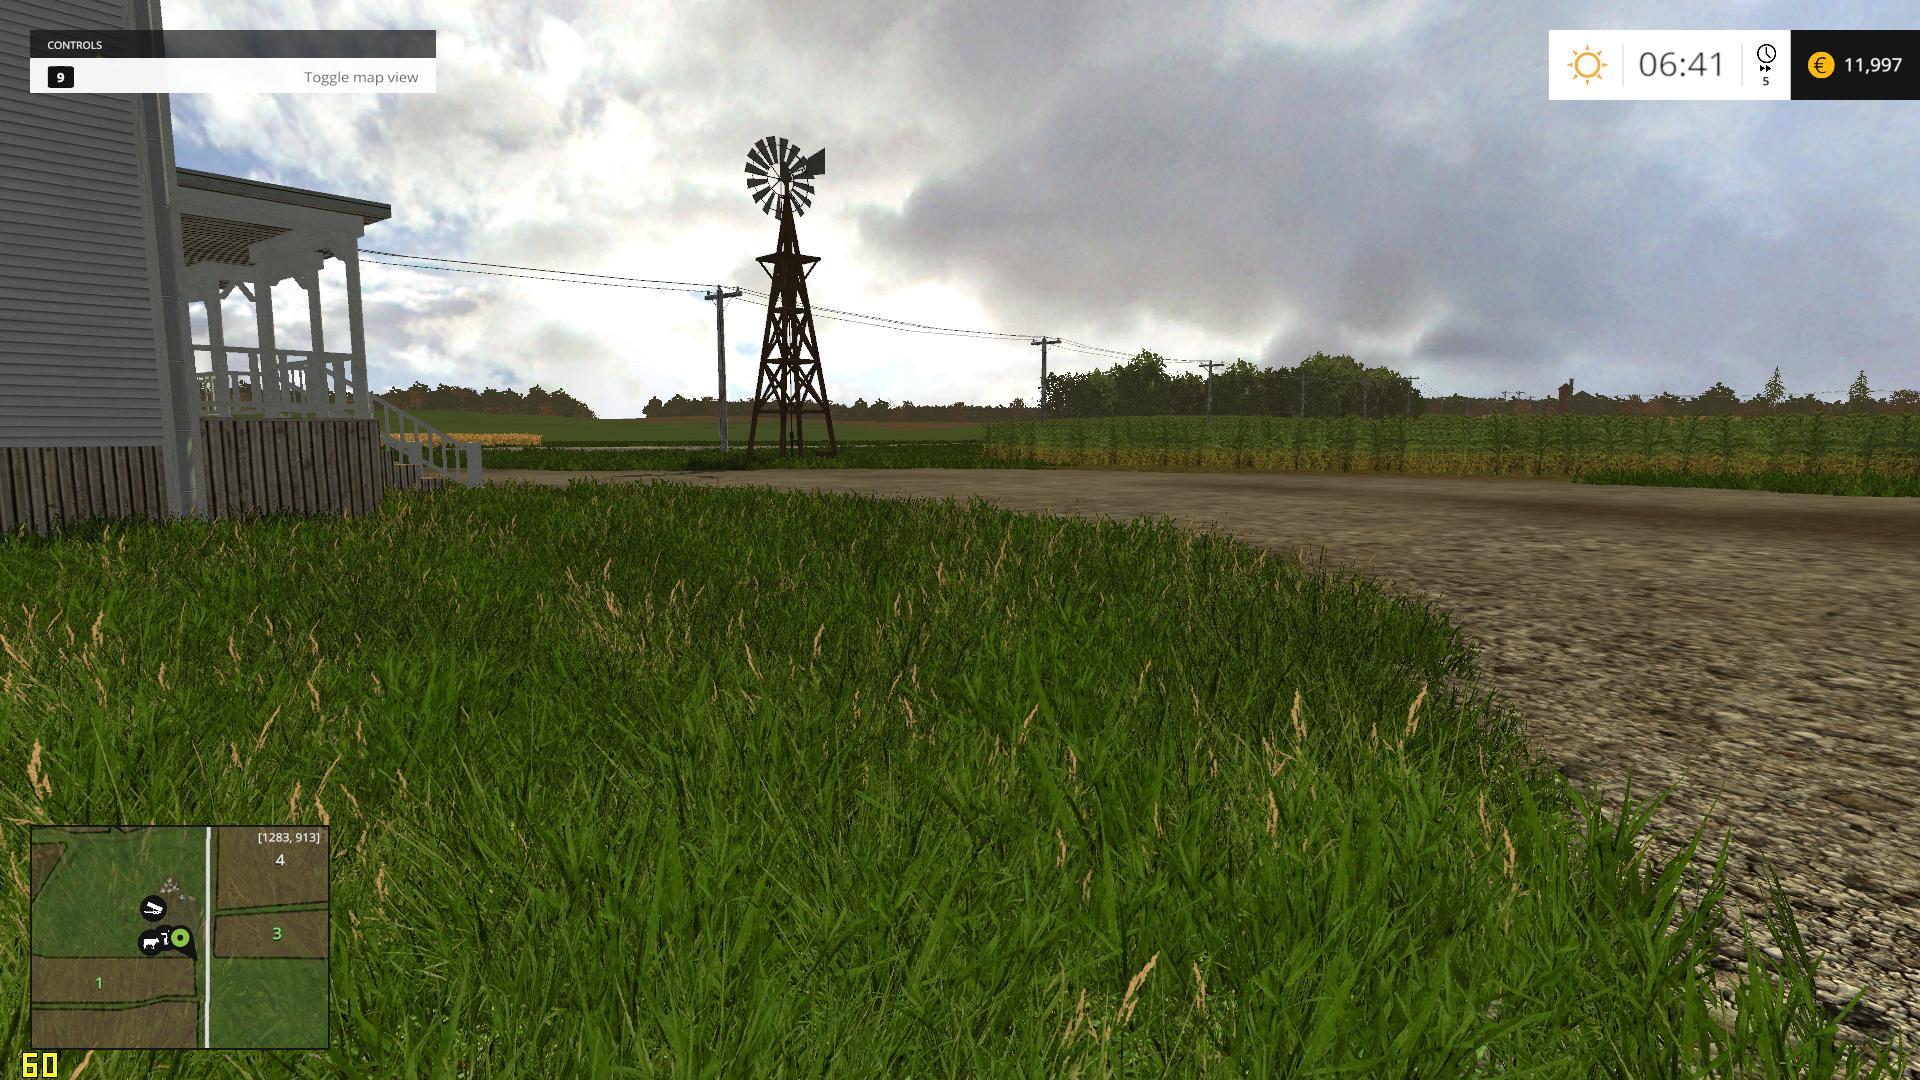 GREAT AMERICAN FARMING Roach And Sam Edit FINAL Modhubus - Us map interactive edit